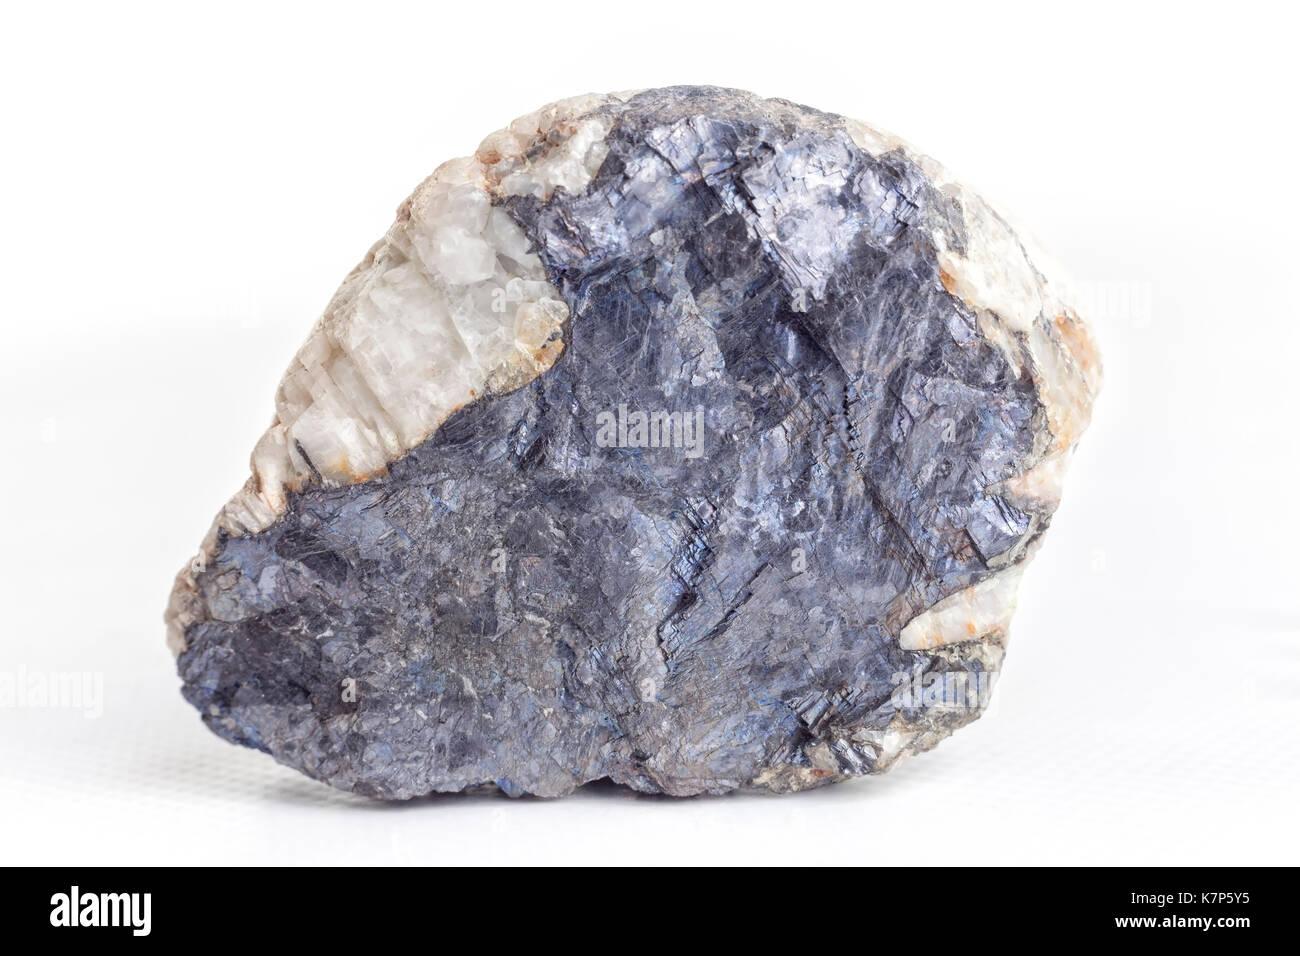 Molybdenite on white background. - Stock Image